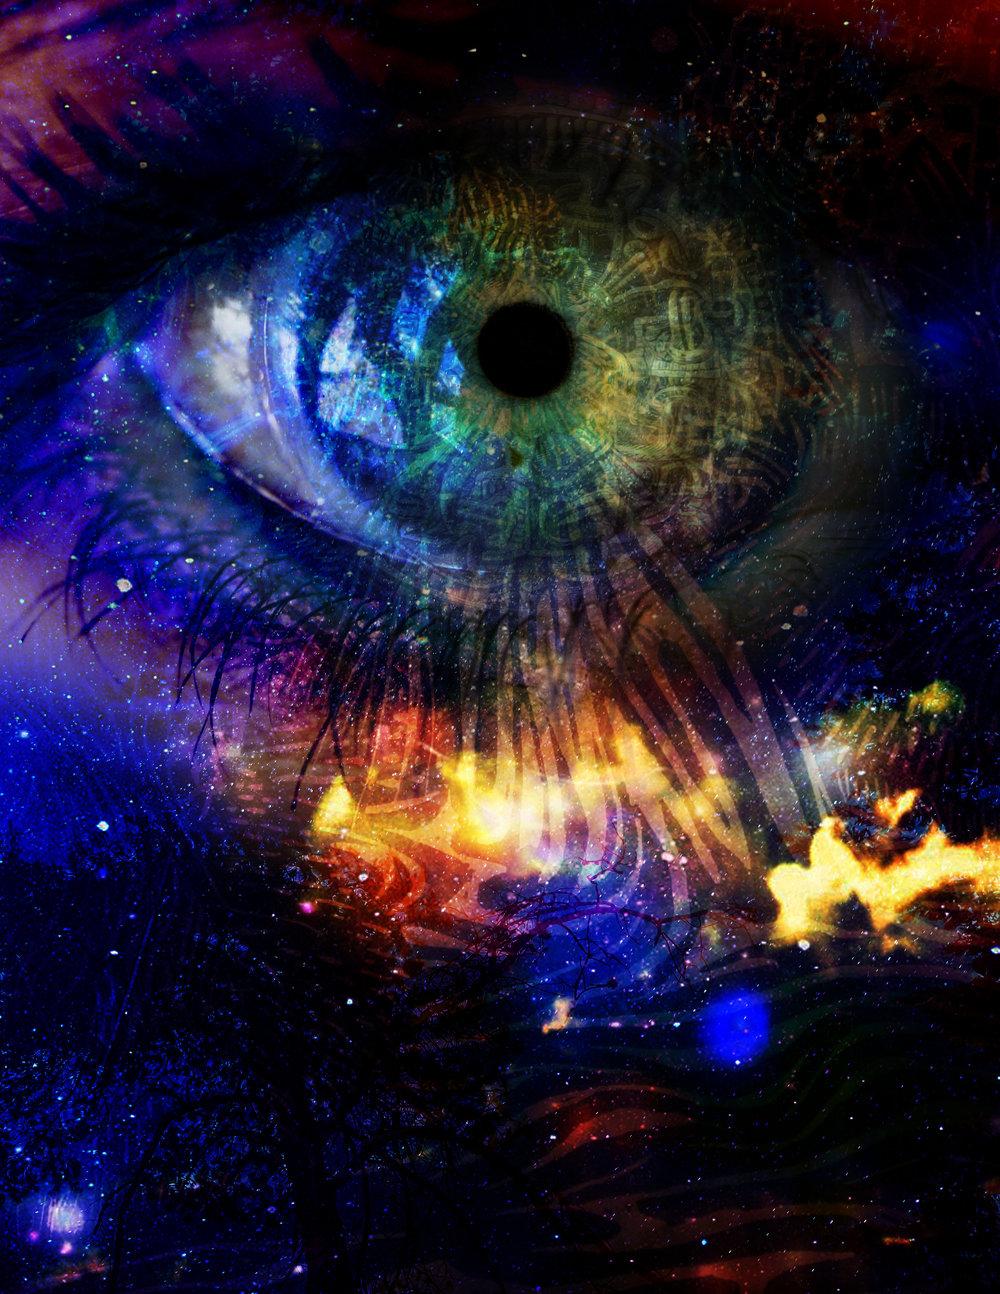 Dwelling Eye.jpg